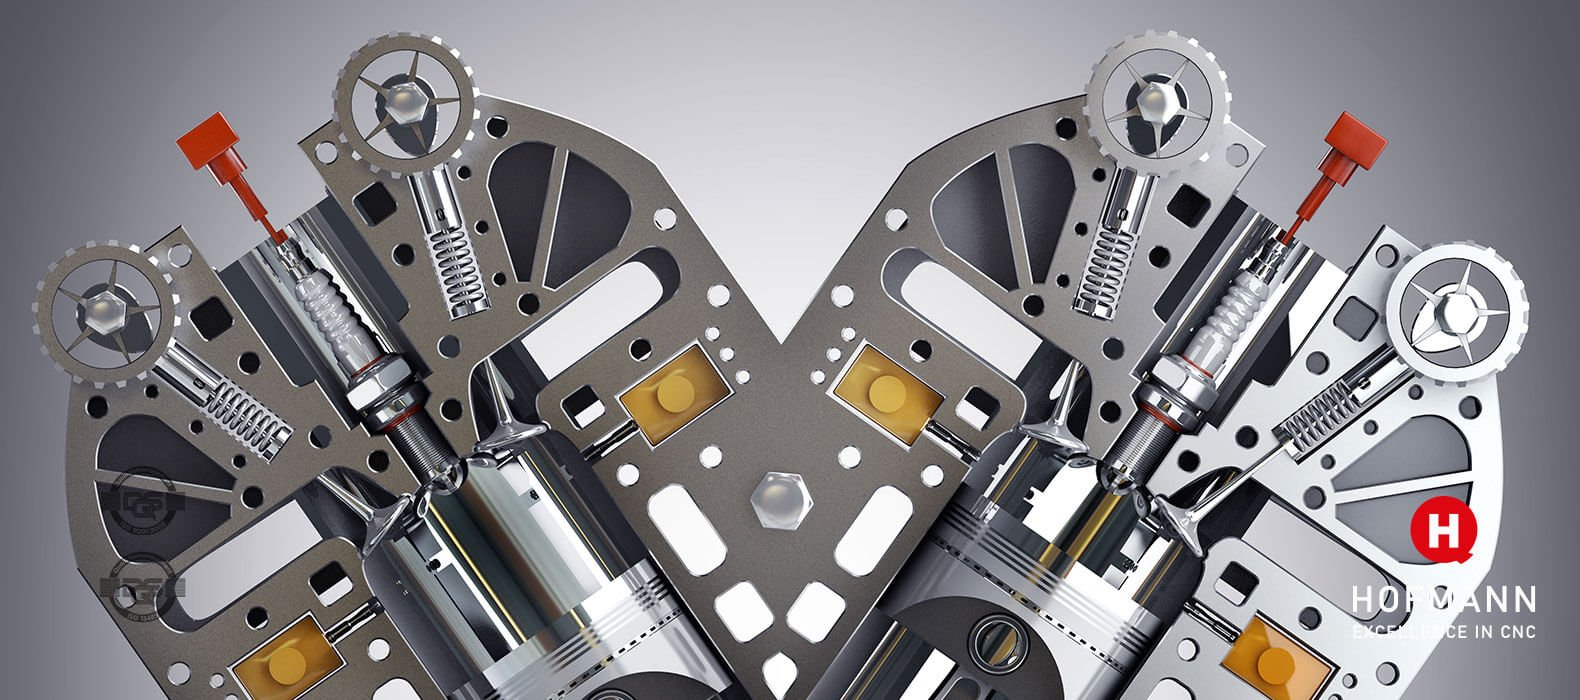 Hofmann CNC Baugruppen Montage